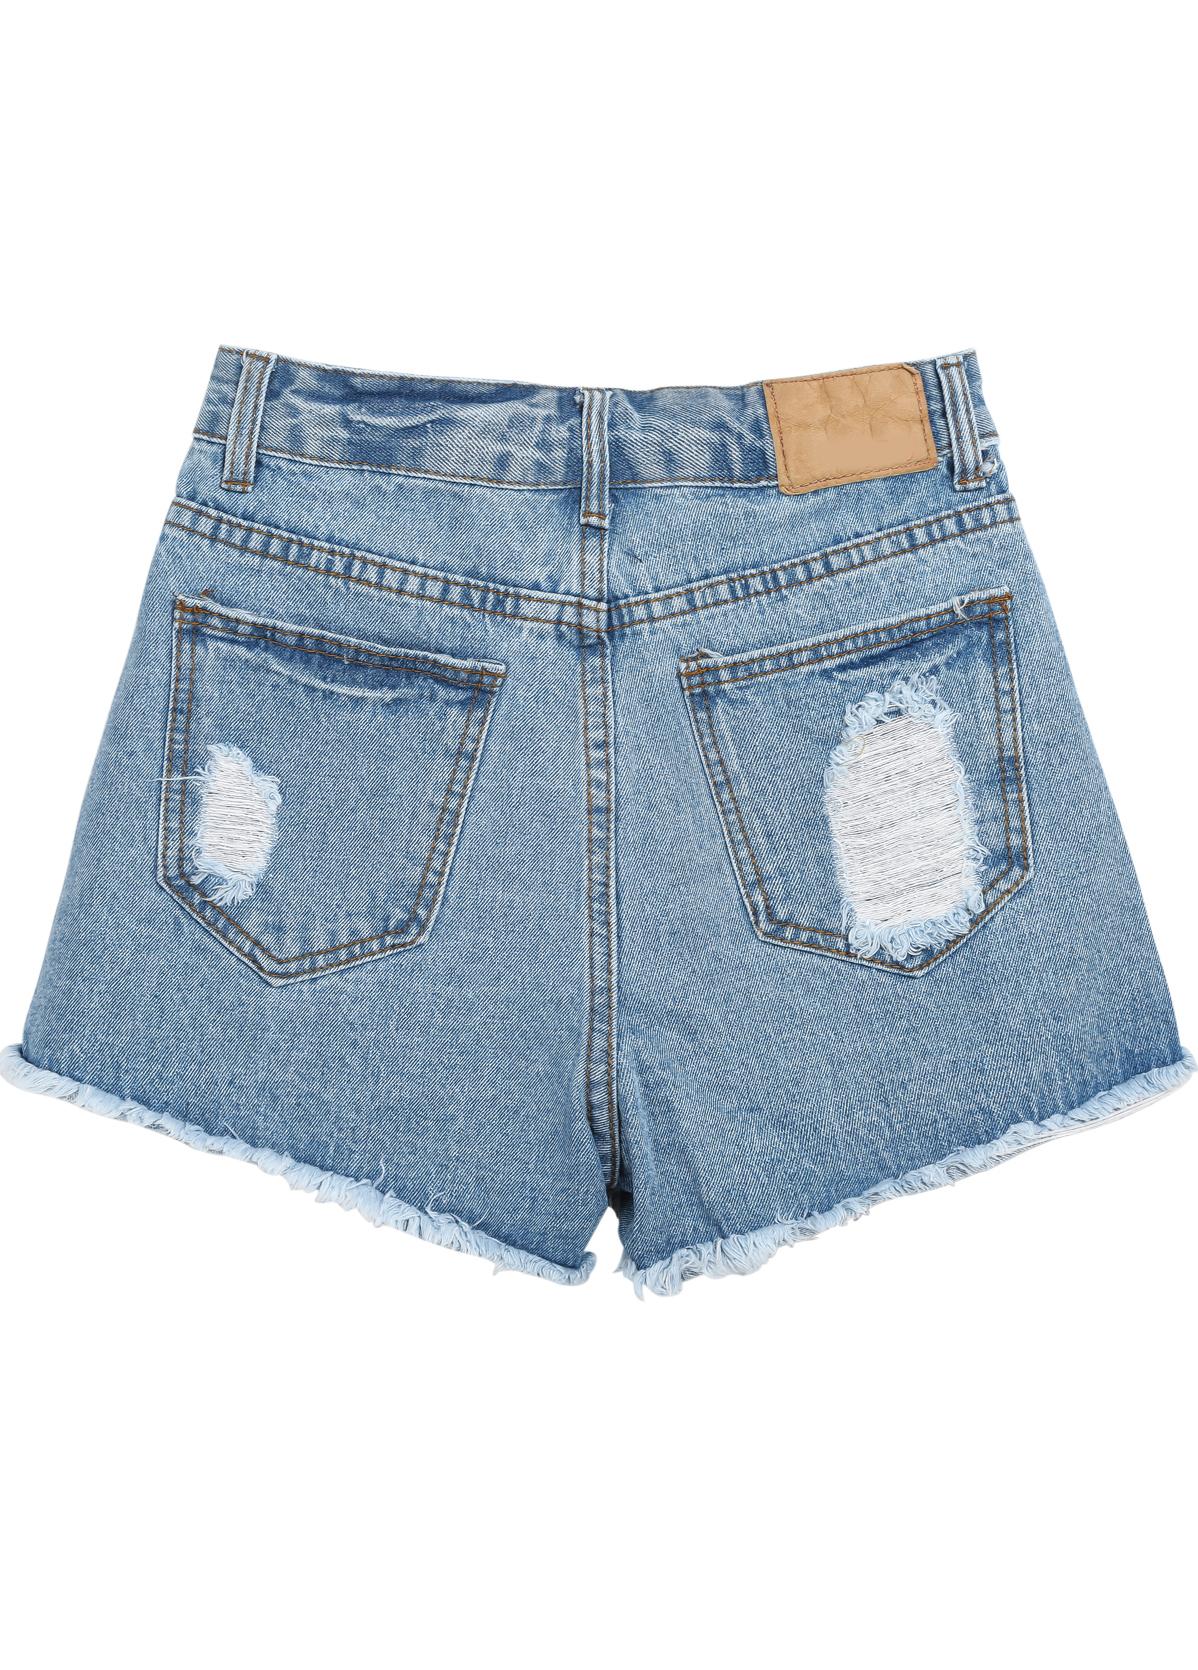 Blue Fringe Ripped Straight Denim Shorts - Sheinside.com